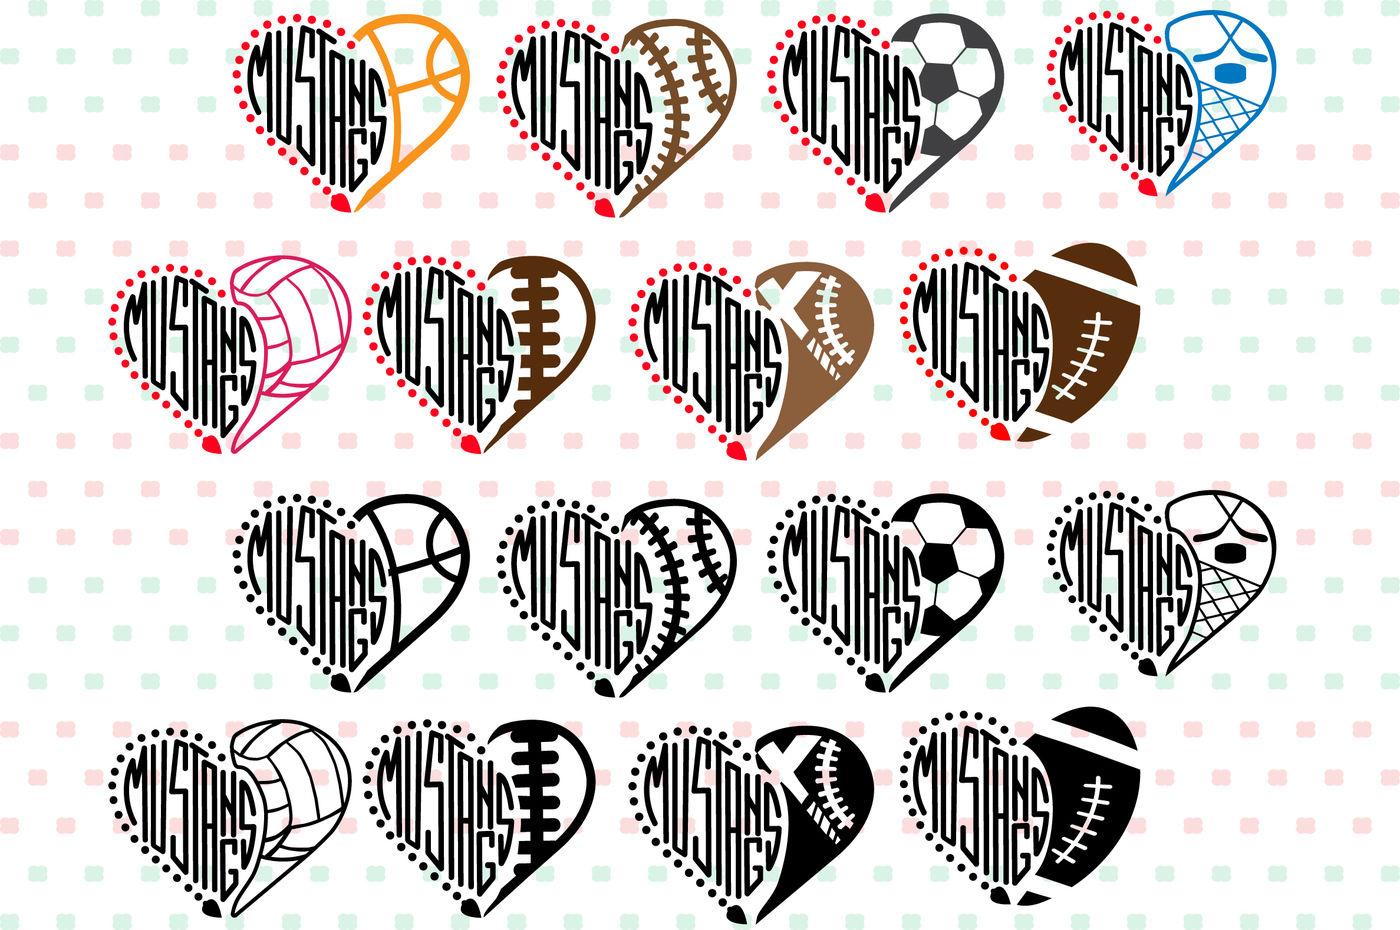 Mustangs Sport Heart Svg Nfl Nba Mlb Ncaaf Cheer High School 913s